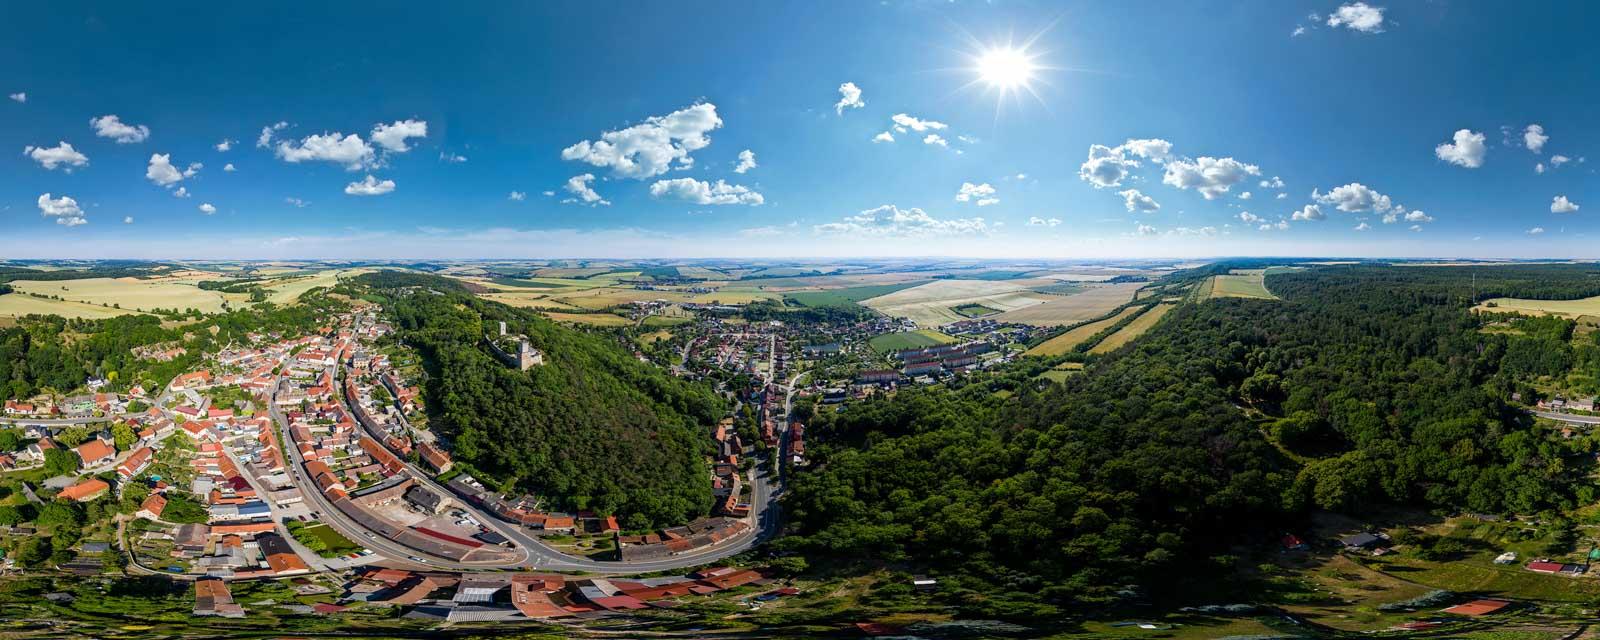 360Grad   Luftaufnahme   Luftpanorama   Drohne